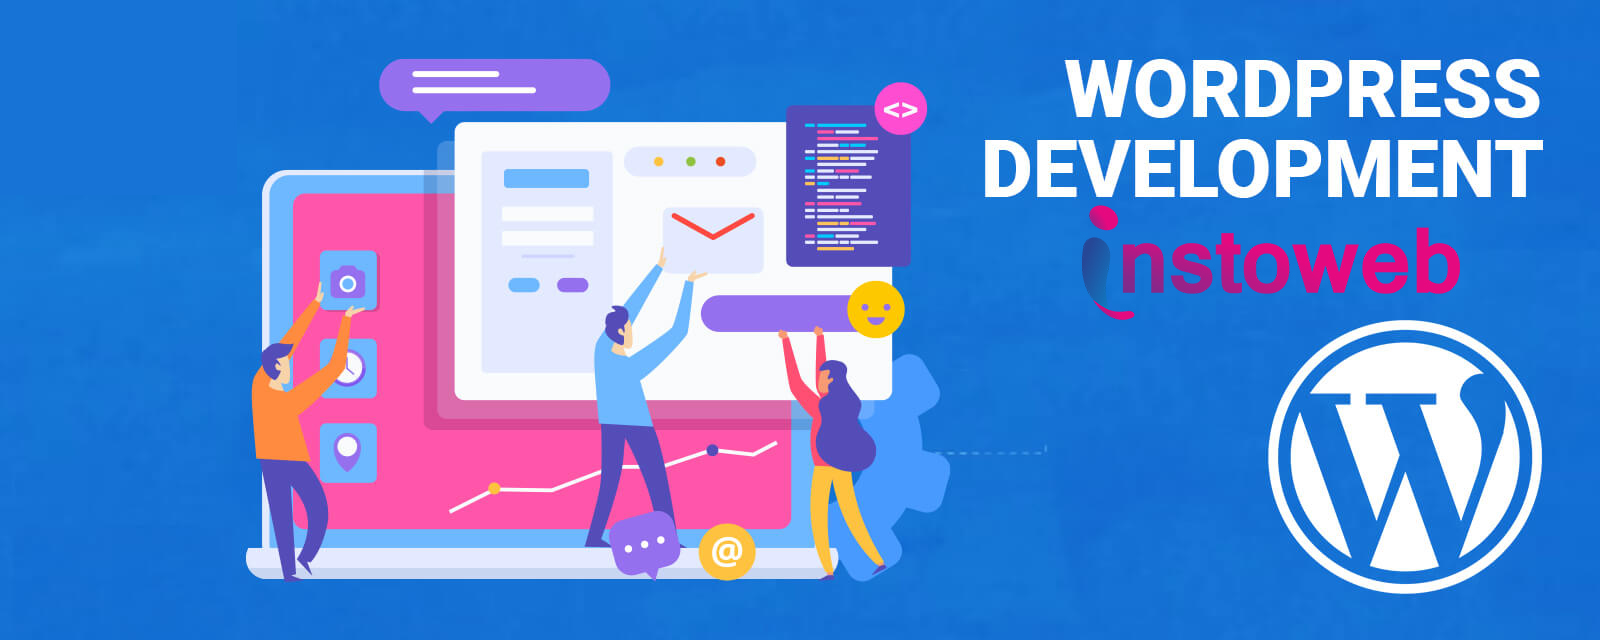 Wordpress Development Services company in bikaner